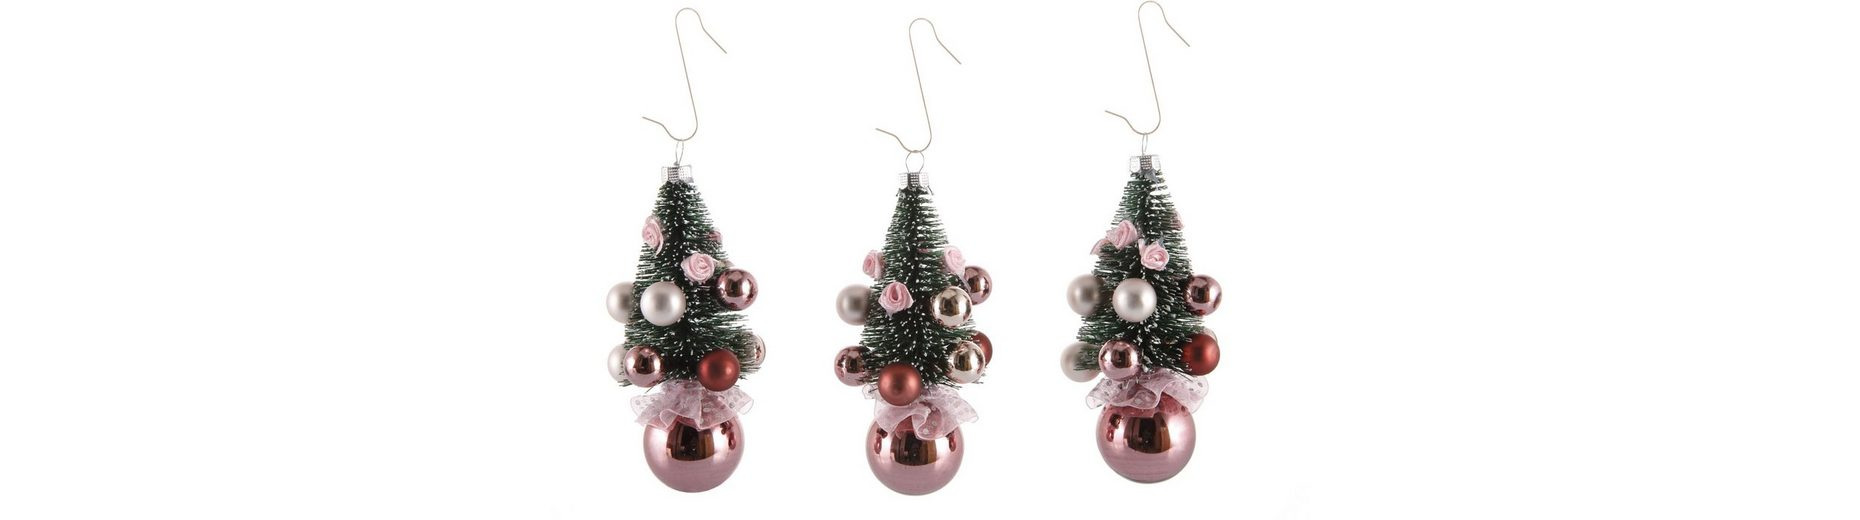 Inge´s Christmas Decor Deko-Bäumchen 3-teilig , »Magic - Avenue of Romance«